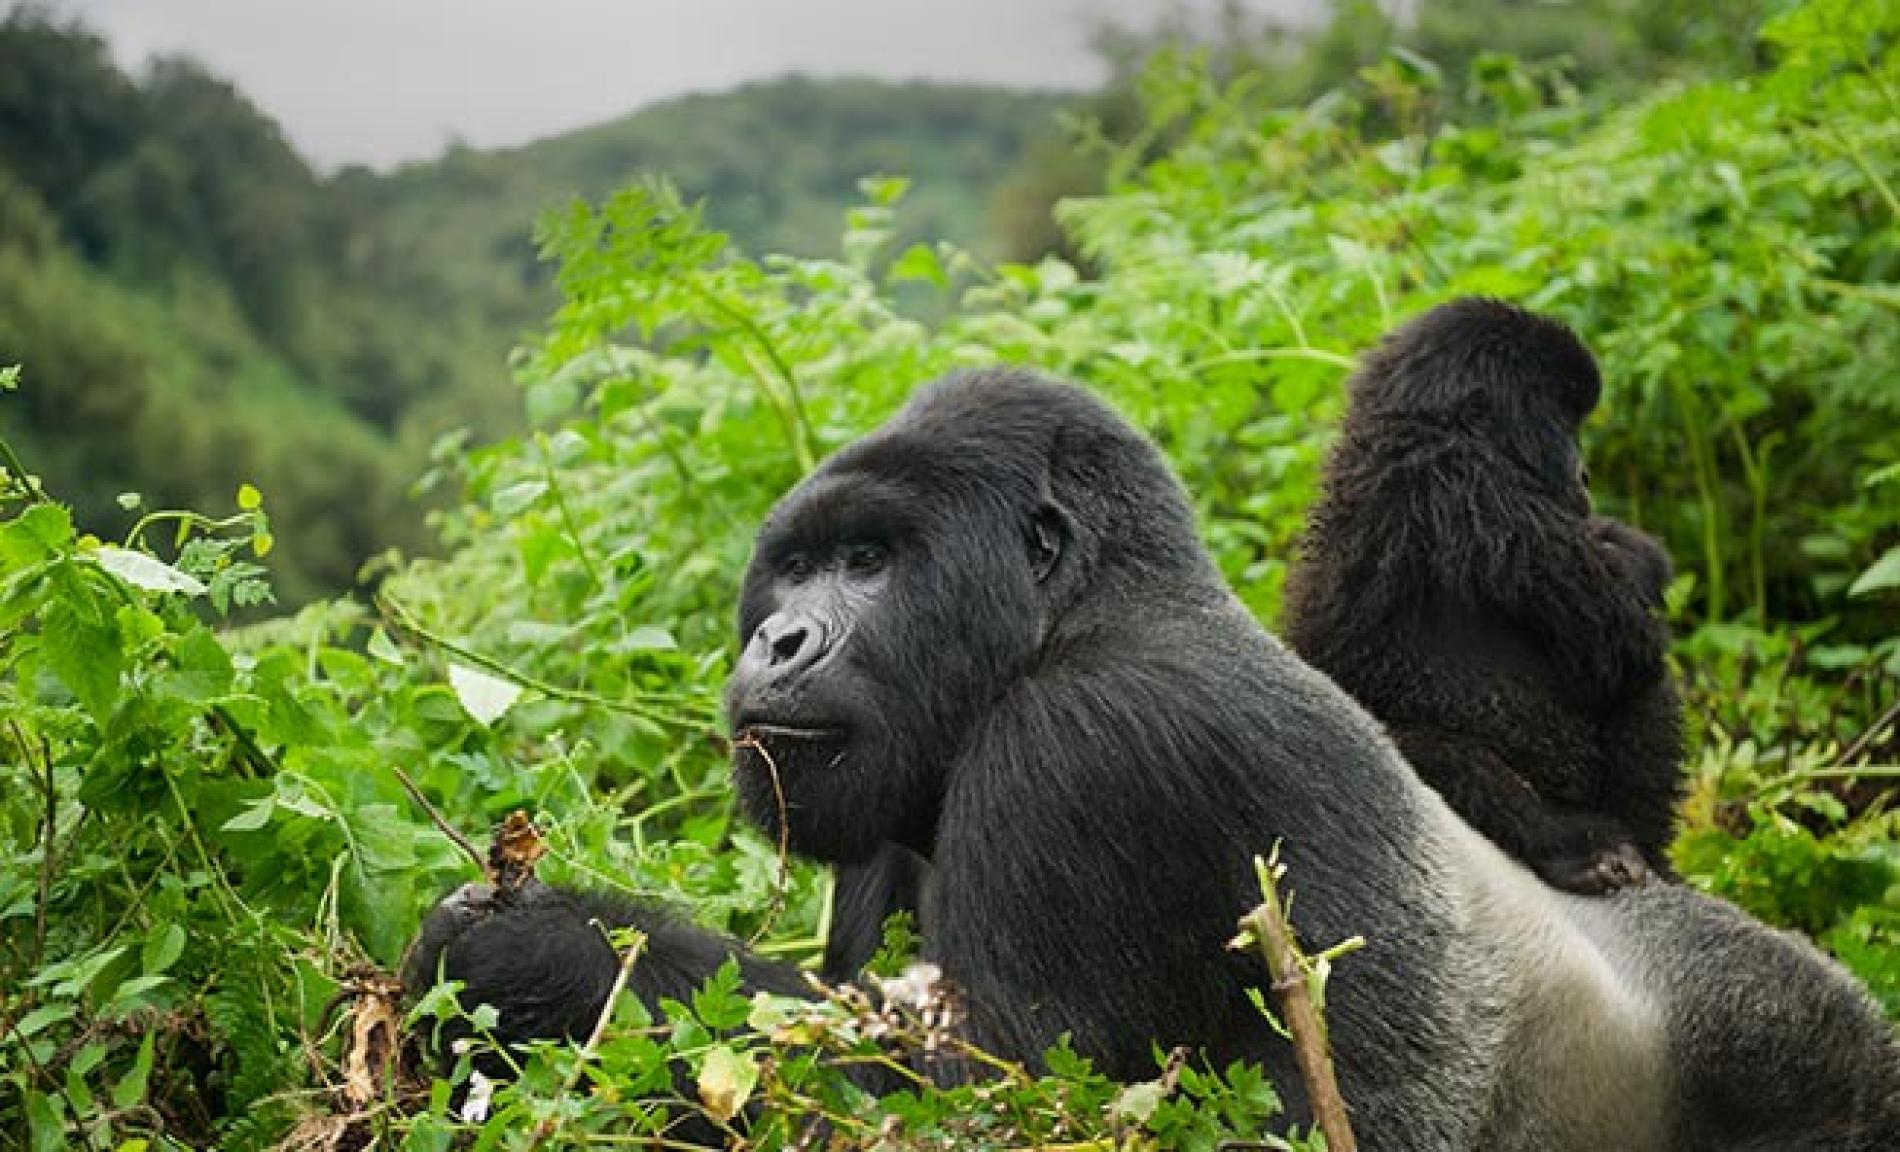 Gorillas No Longer In The Mist